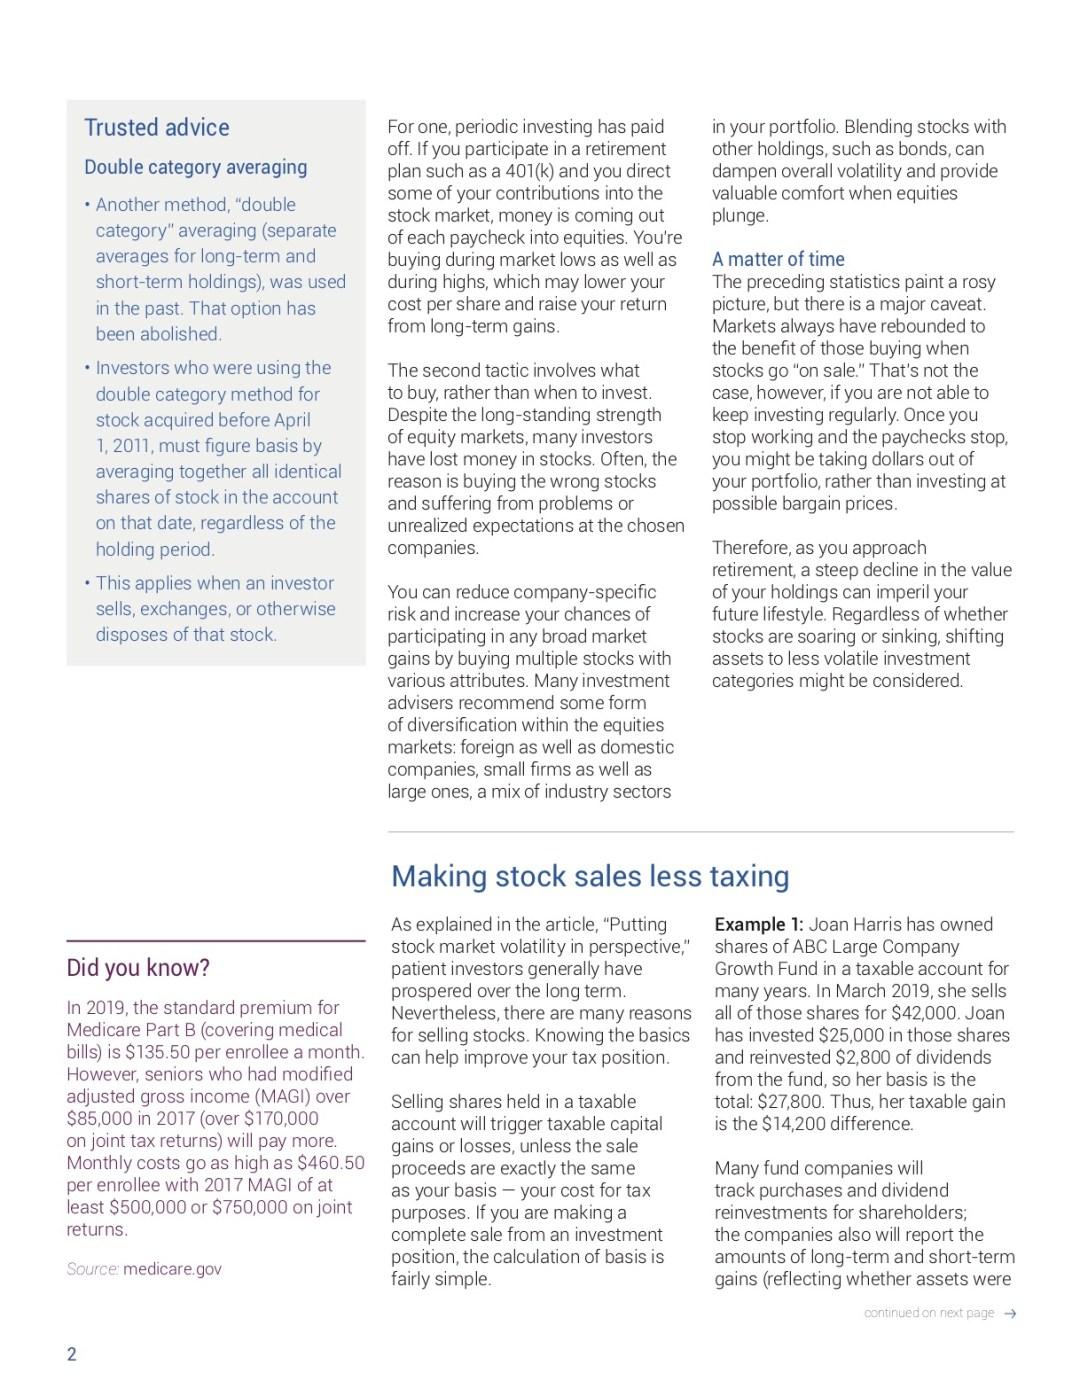 virtual cpa, stock market volatility, stock sales less tax, new tax law